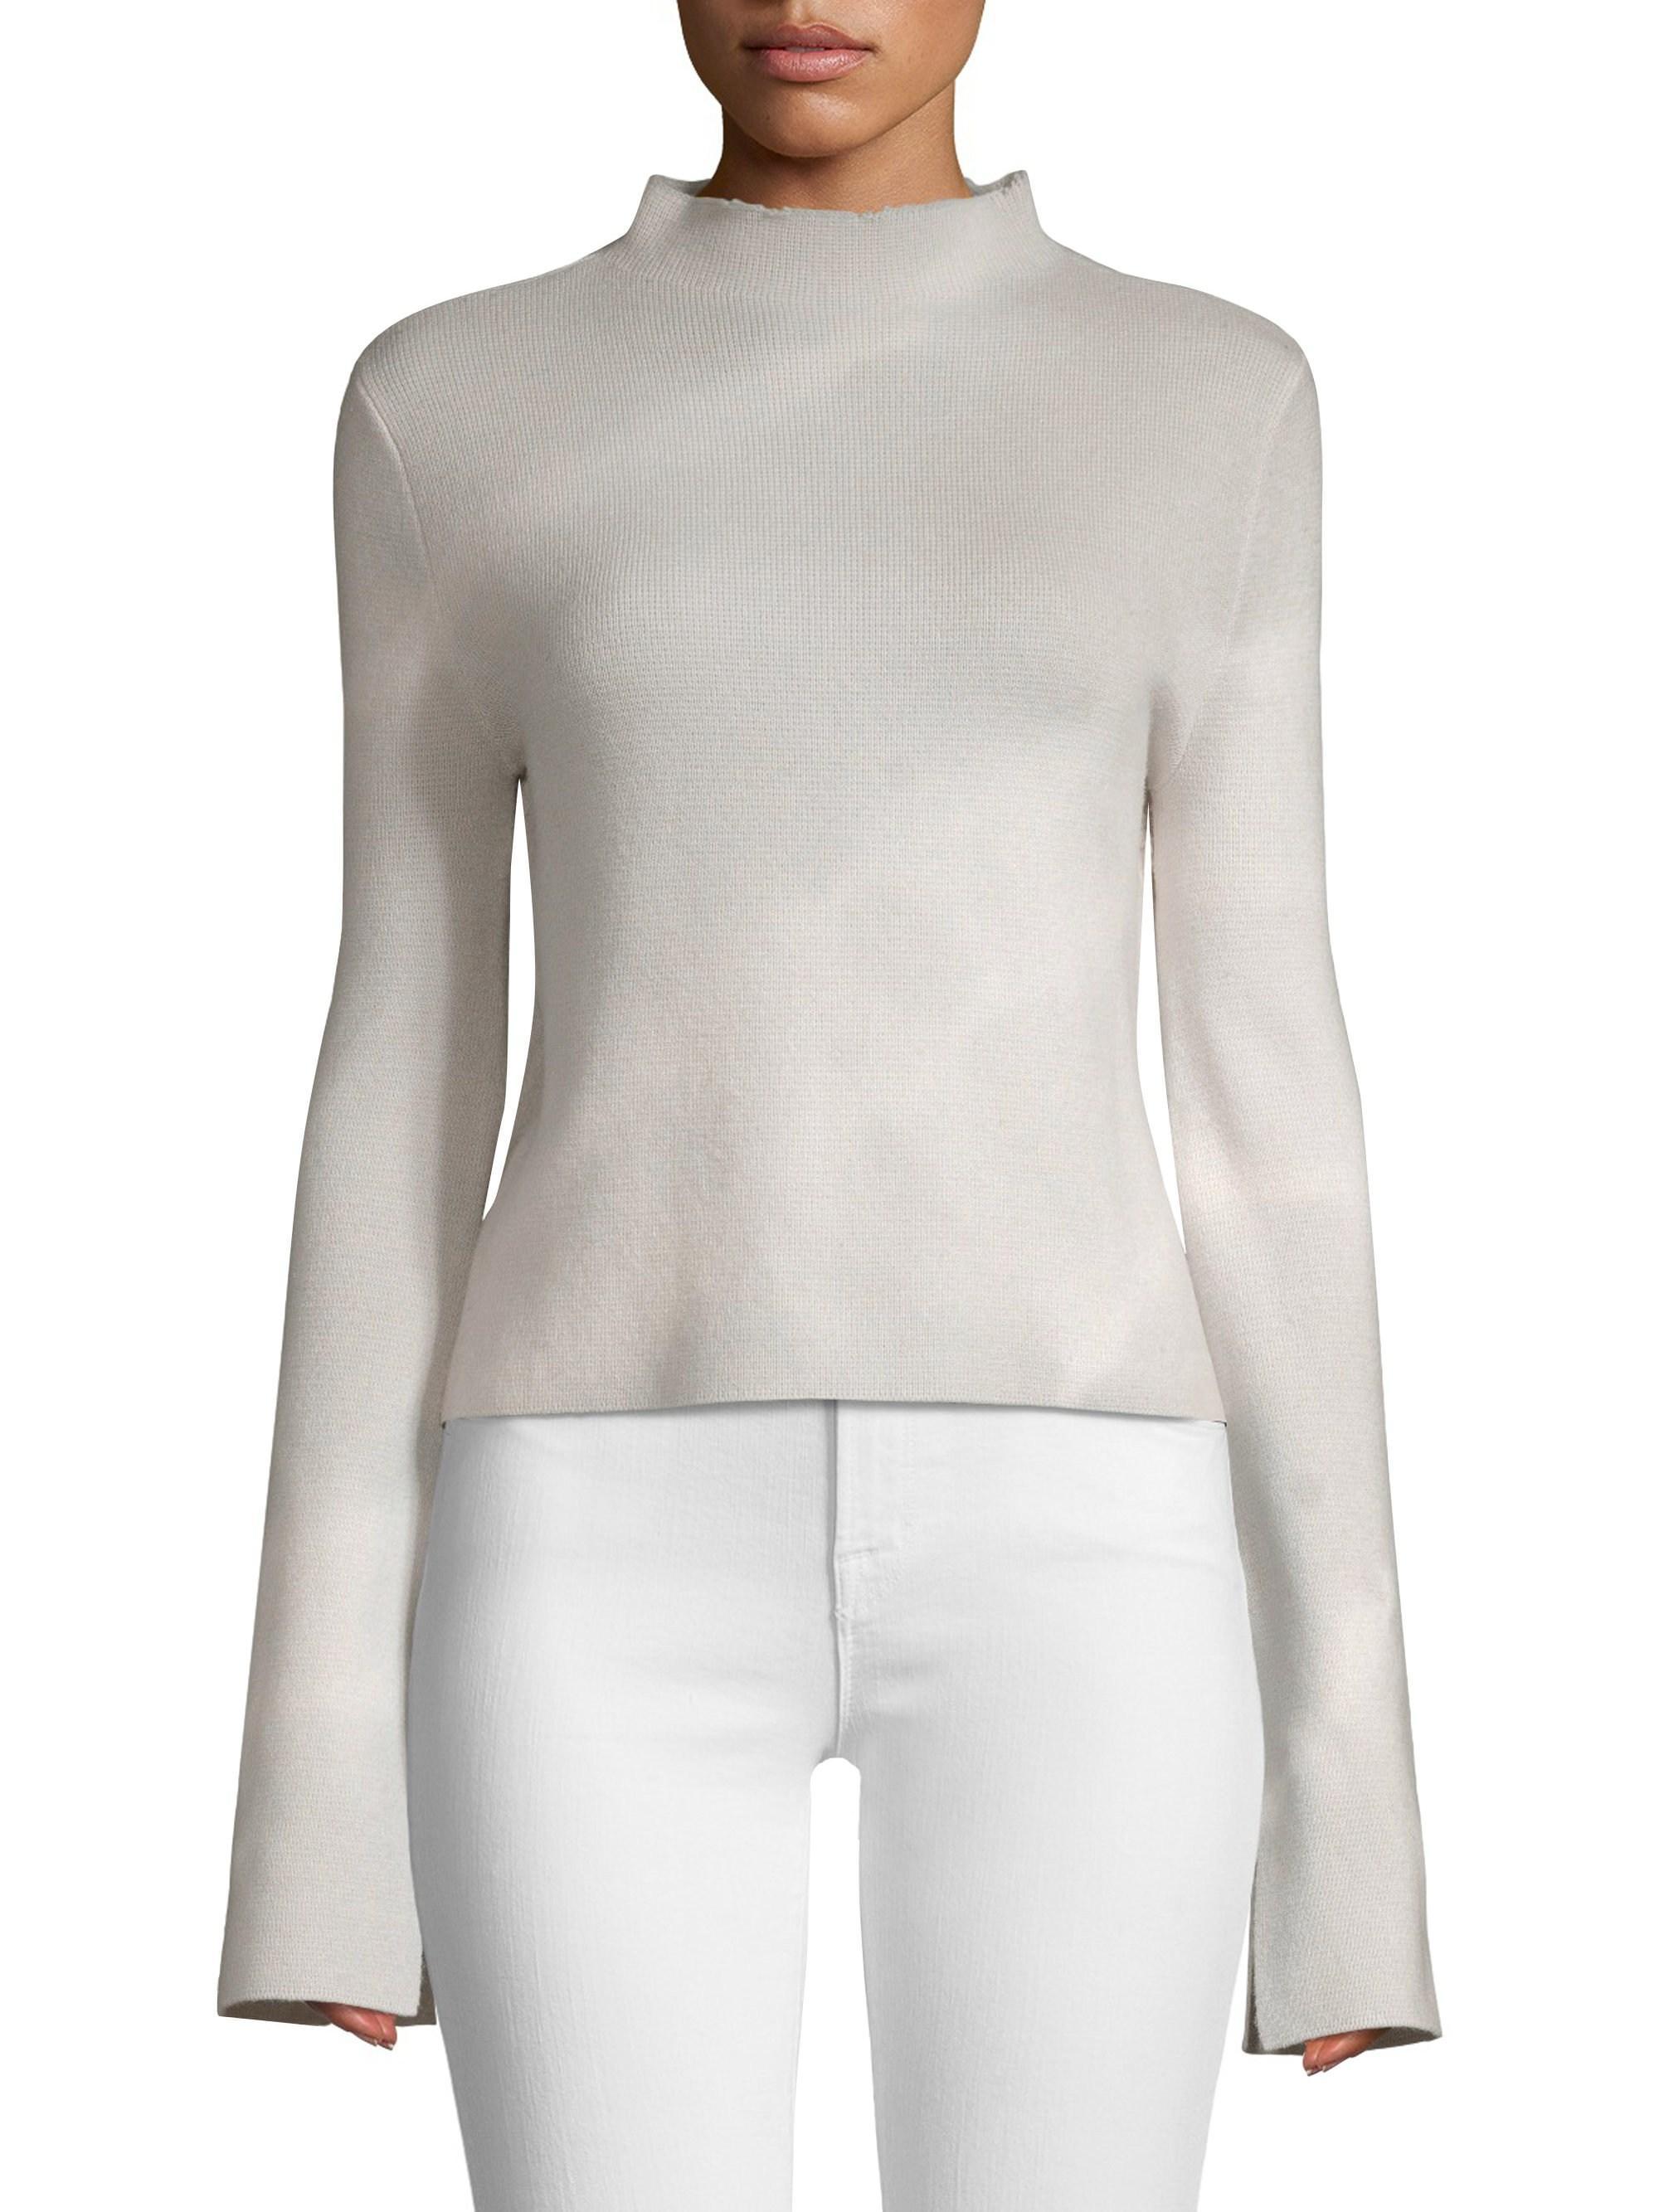 95301e99ab36 Zoe Jordan - Women s Munday Cashmere   Wool Funnelneck Sweater - Ash White  - Lyst. View fullscreen